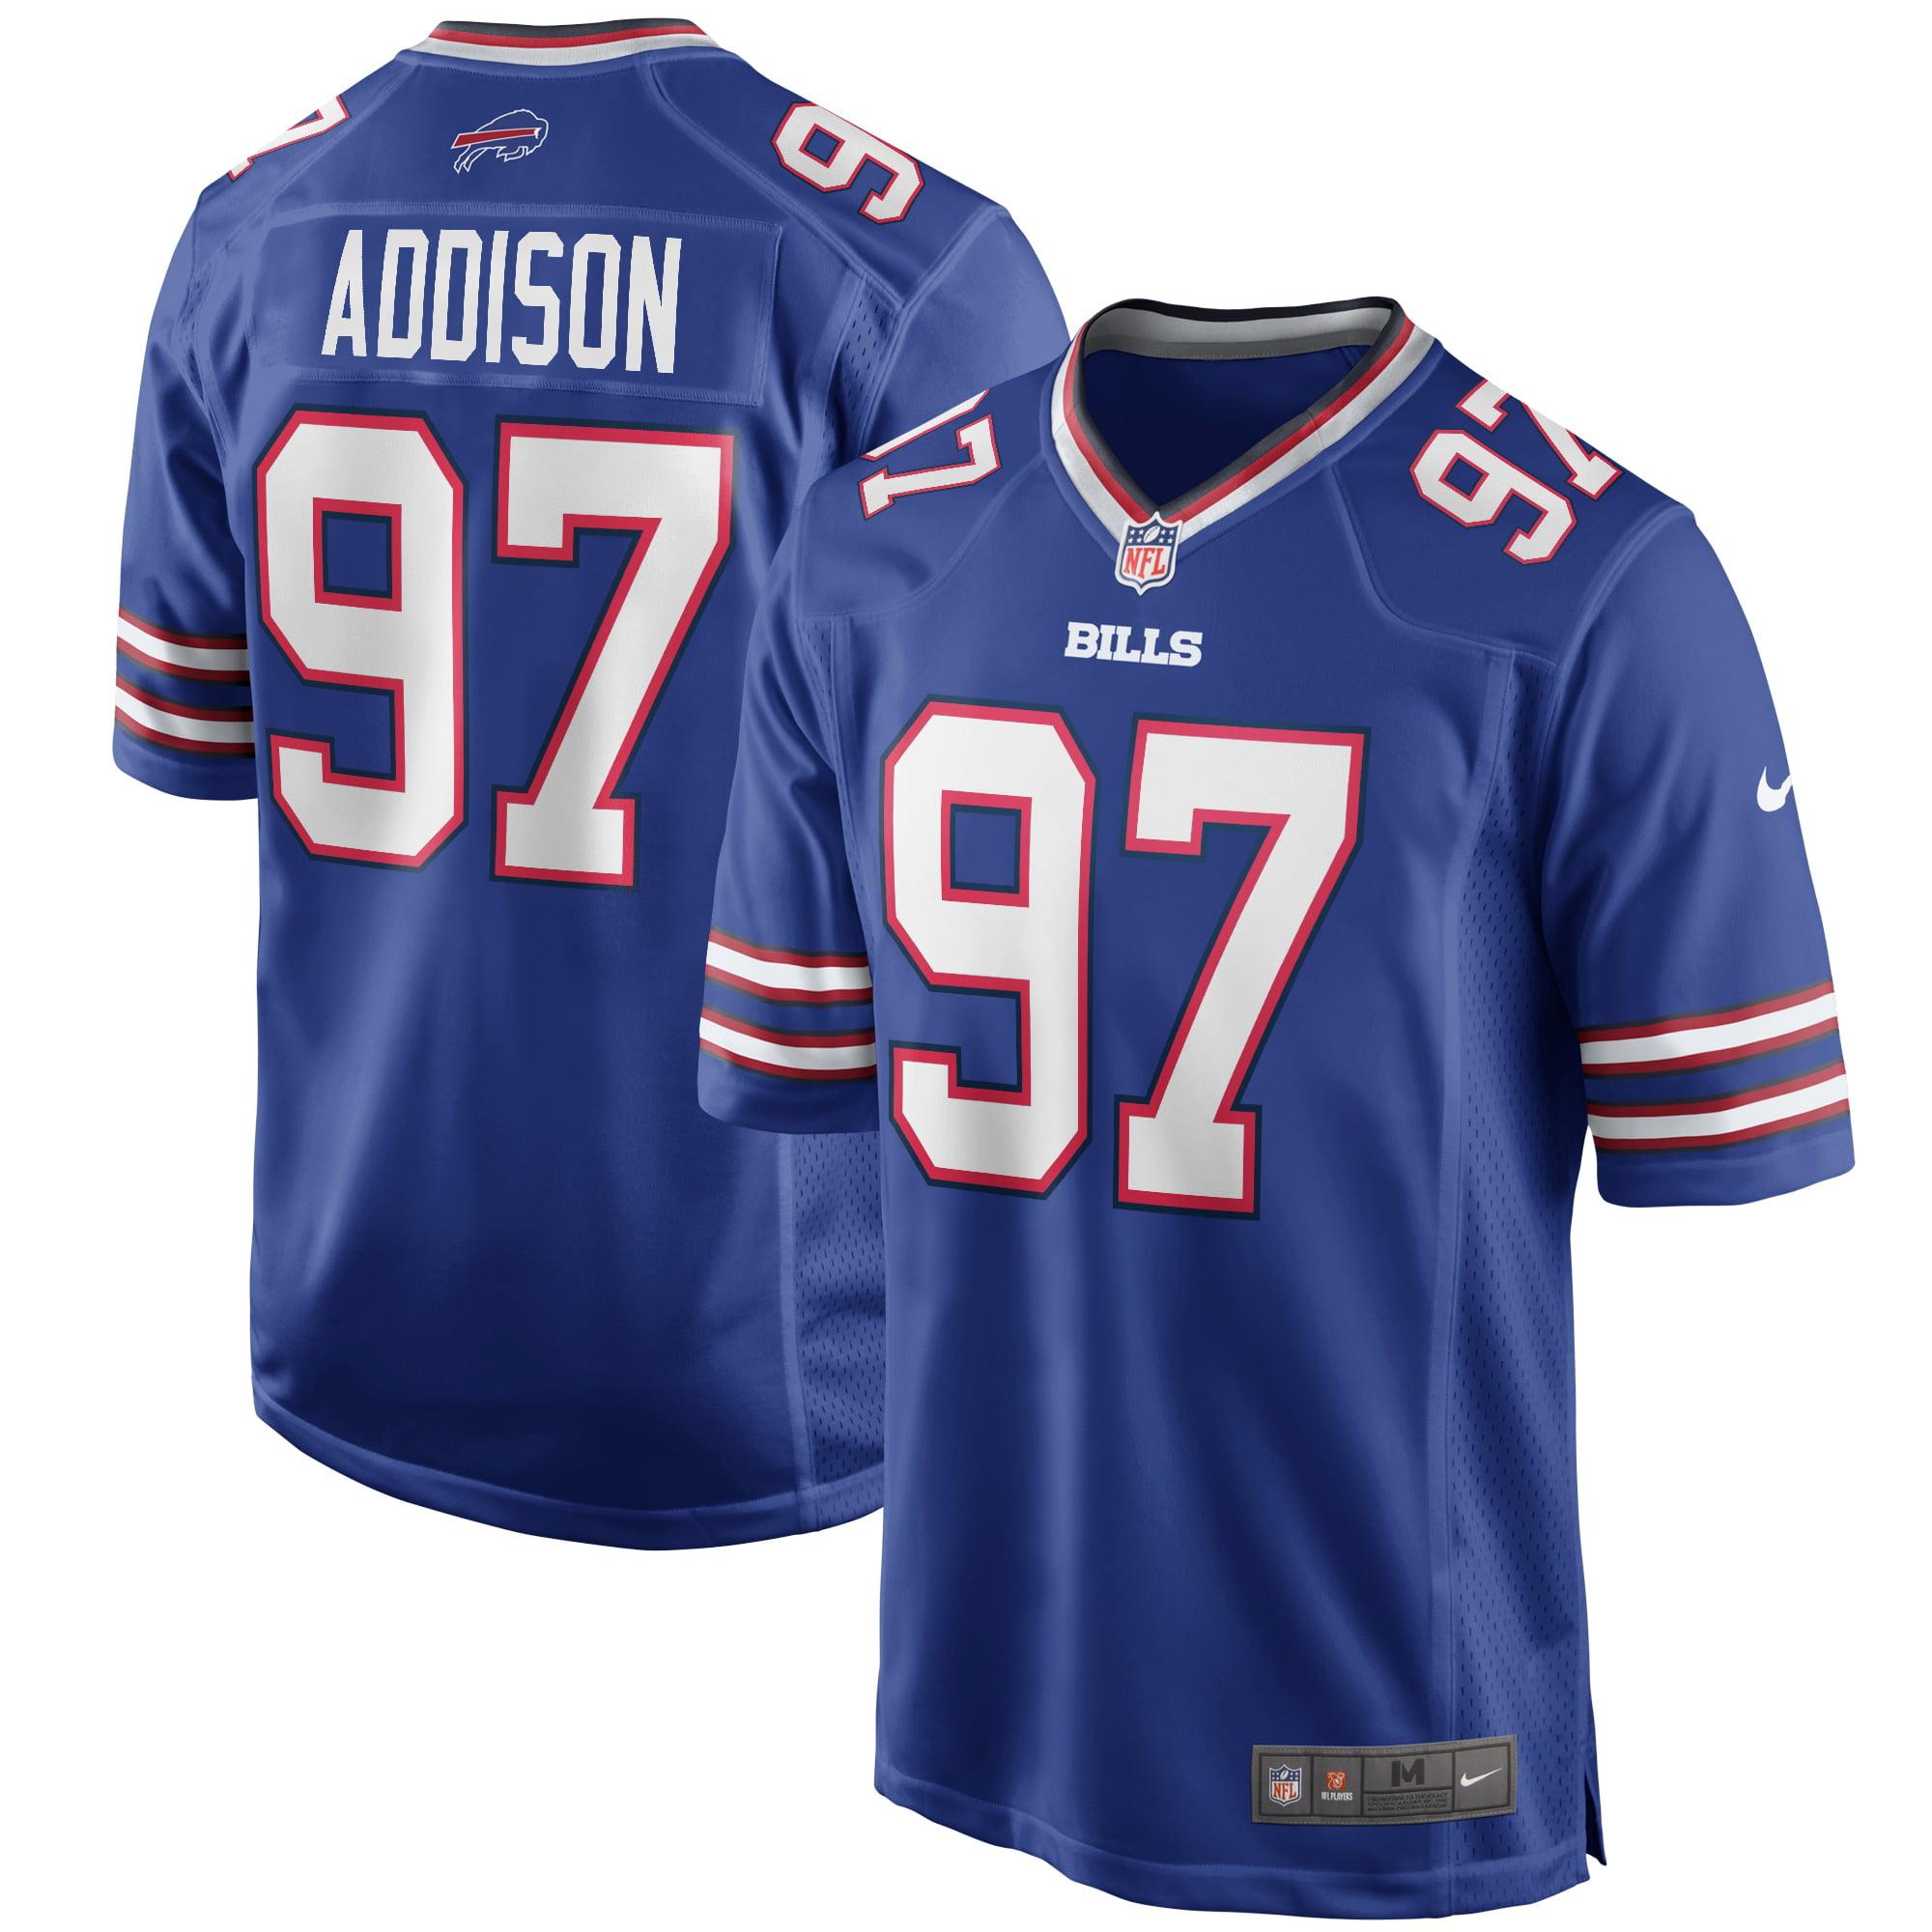 Mario Addison Buffalo Bills Nike Game Player Jersey - Royal - Walmart.com